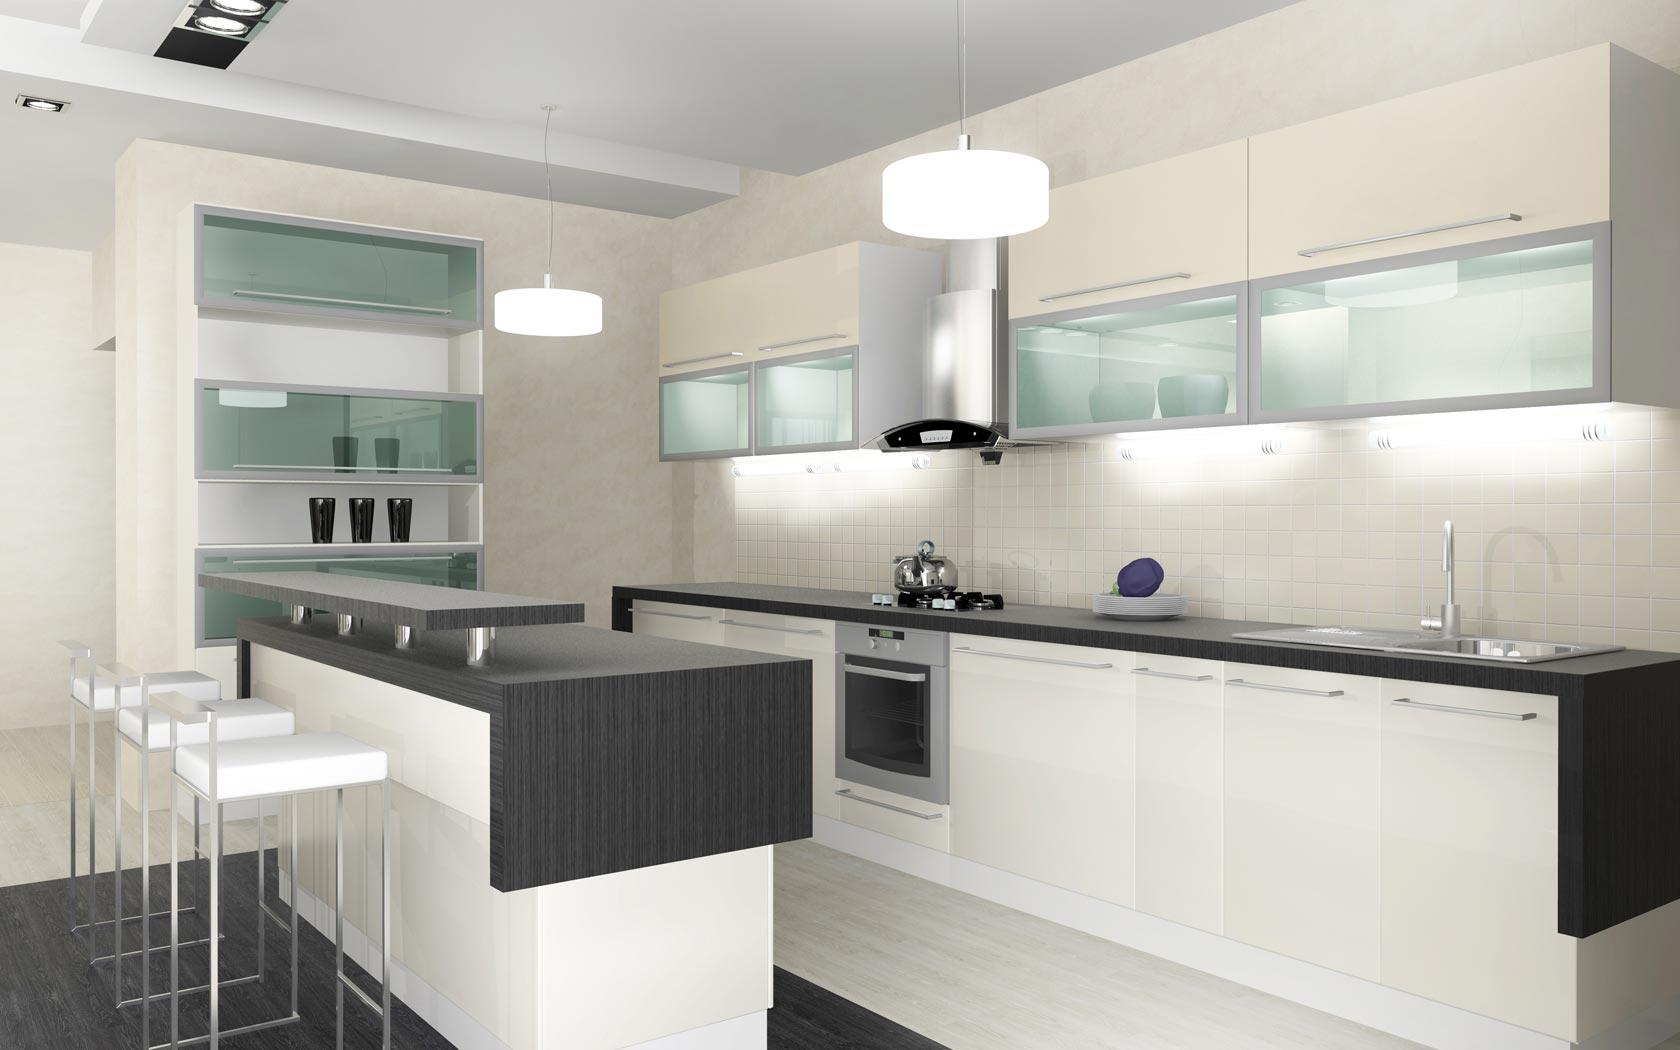 Carpinteria mmg - Planificador de cocinas 3d ...